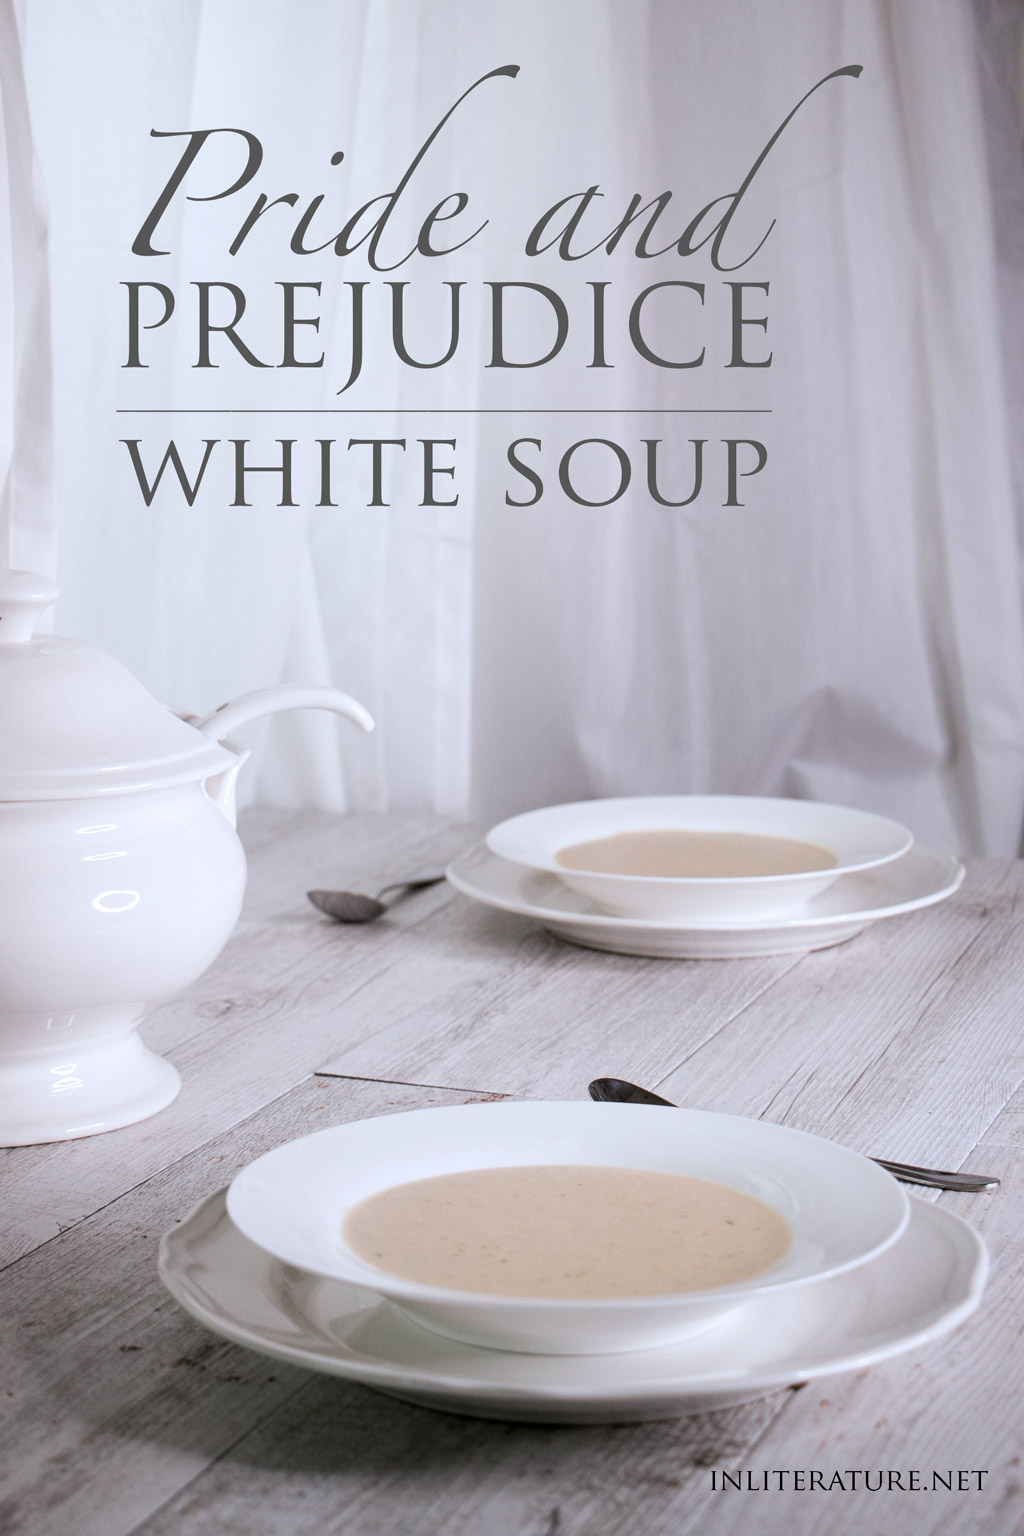 White Soup   Pride and Prejudice